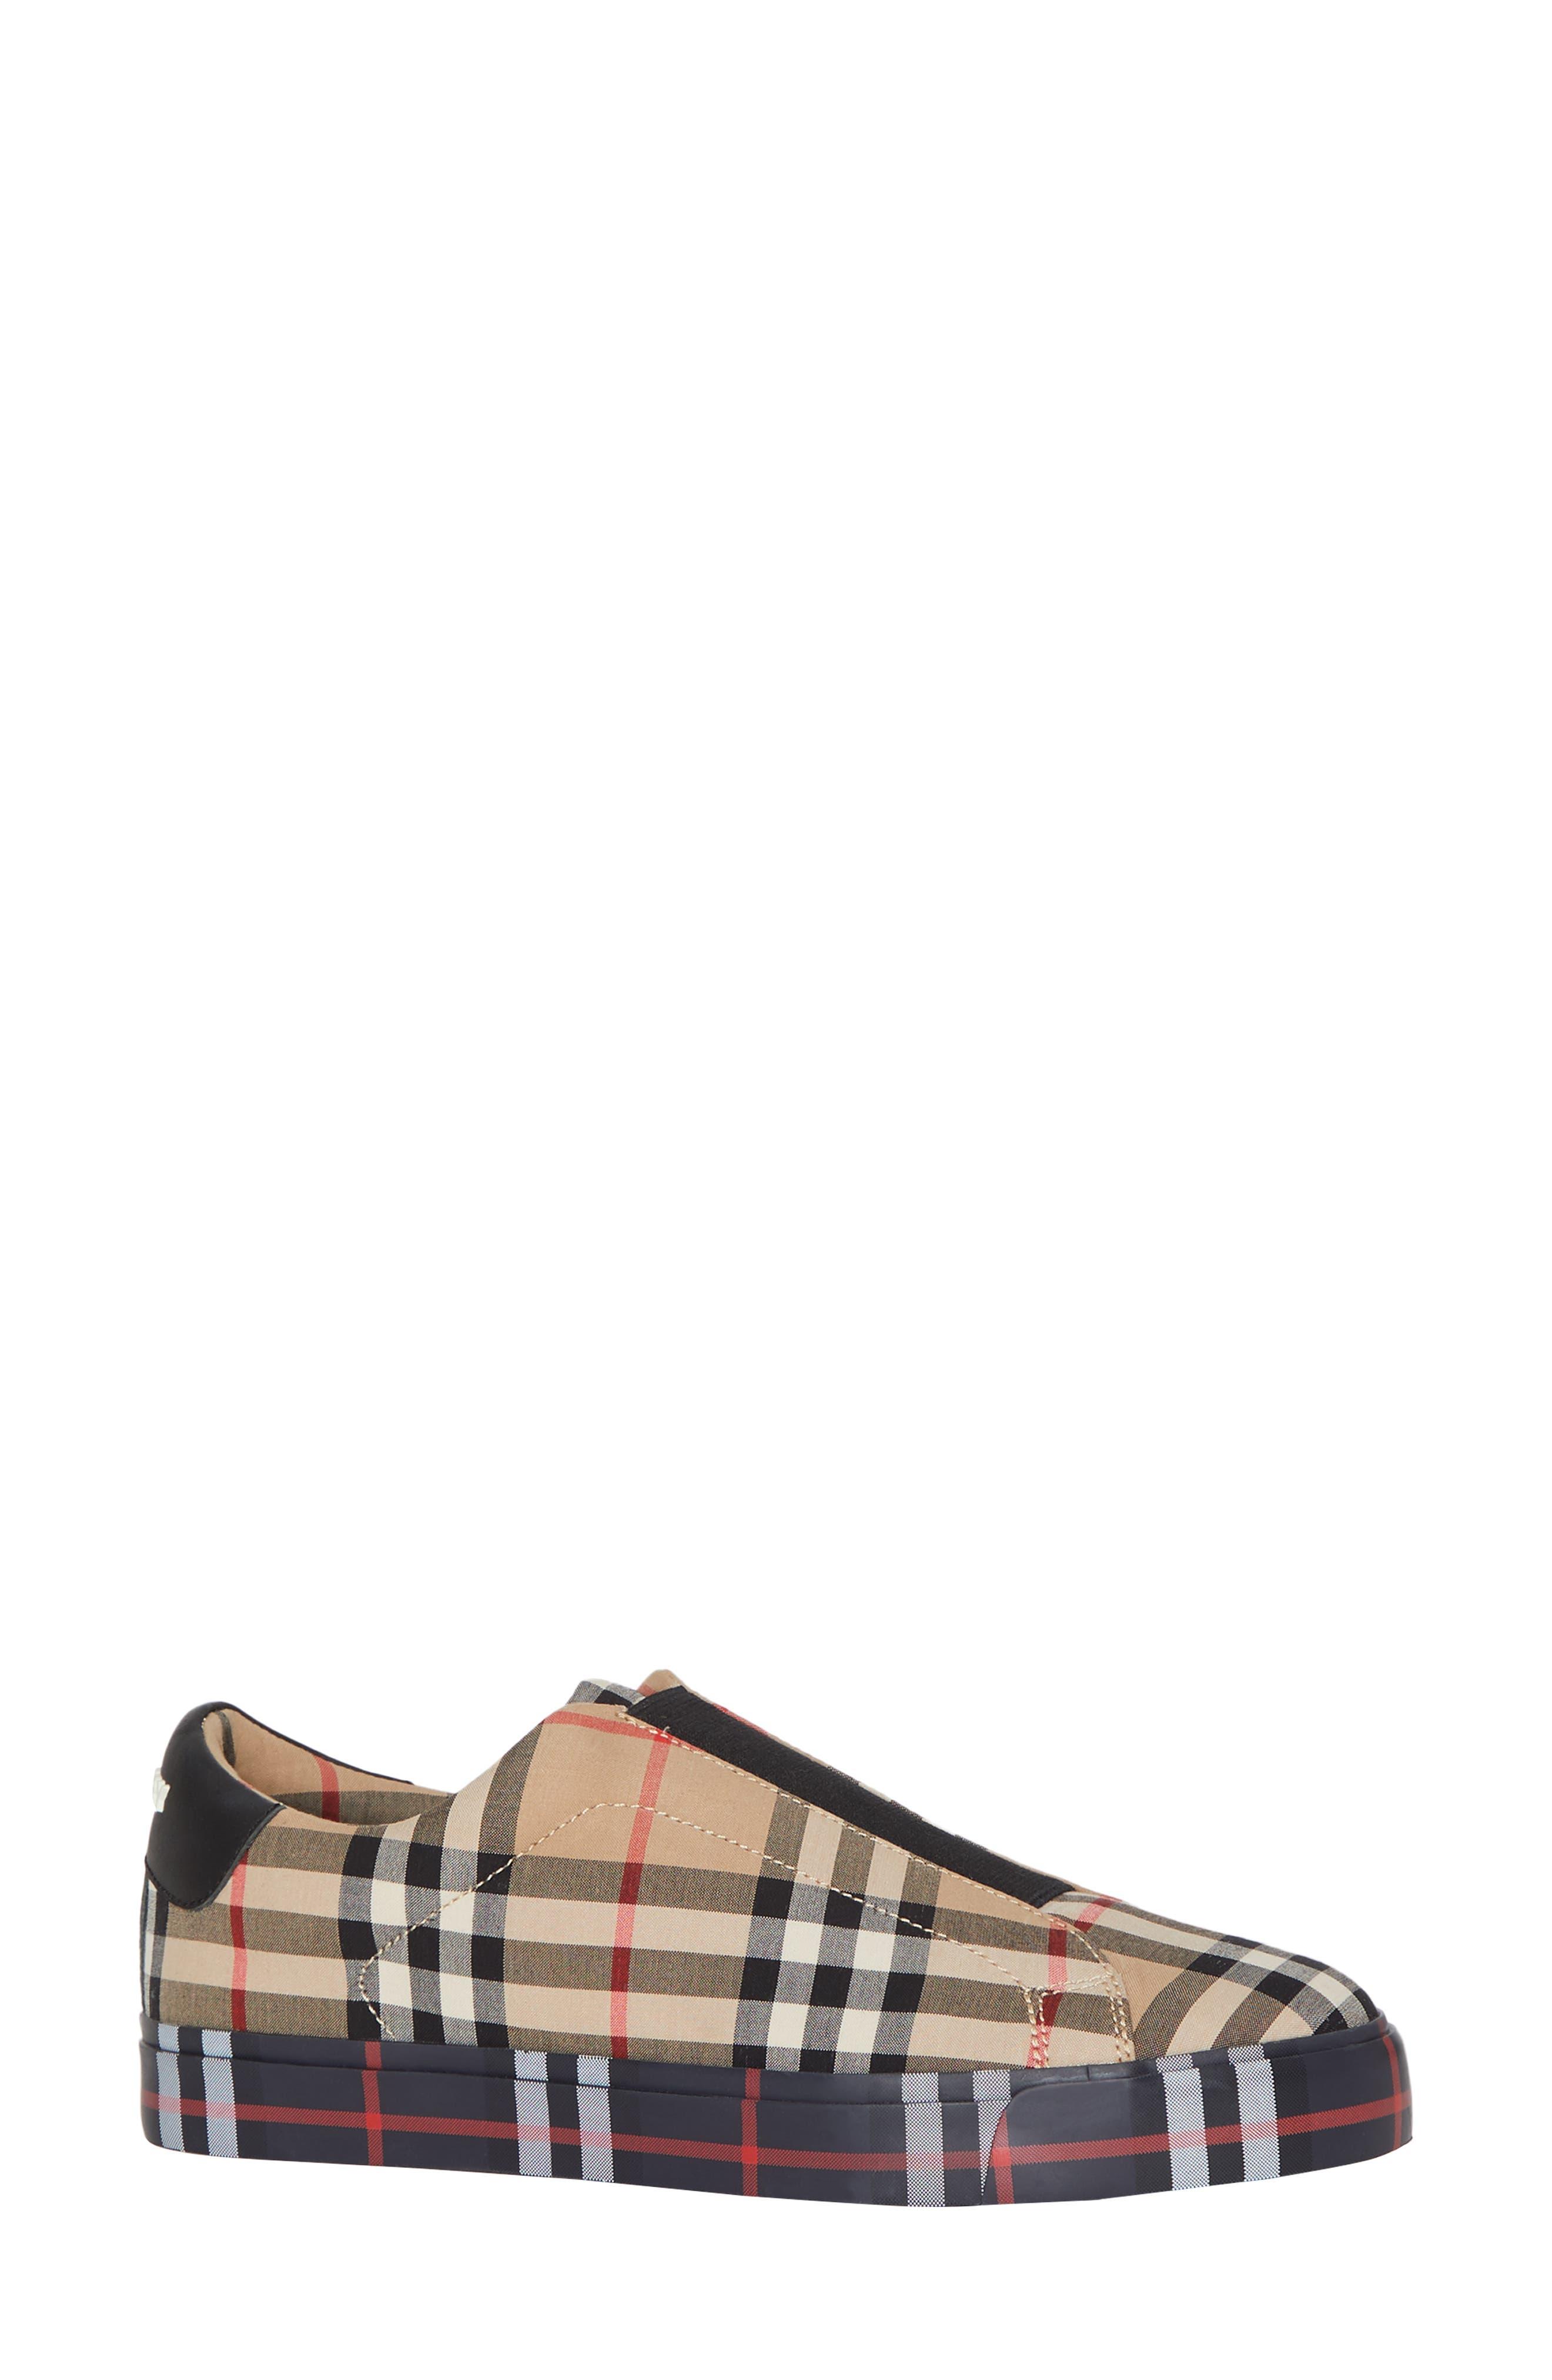 BURBERRY Markham Vintage Check Slip-On Sneaker, Main, color, BEIGE PLAID